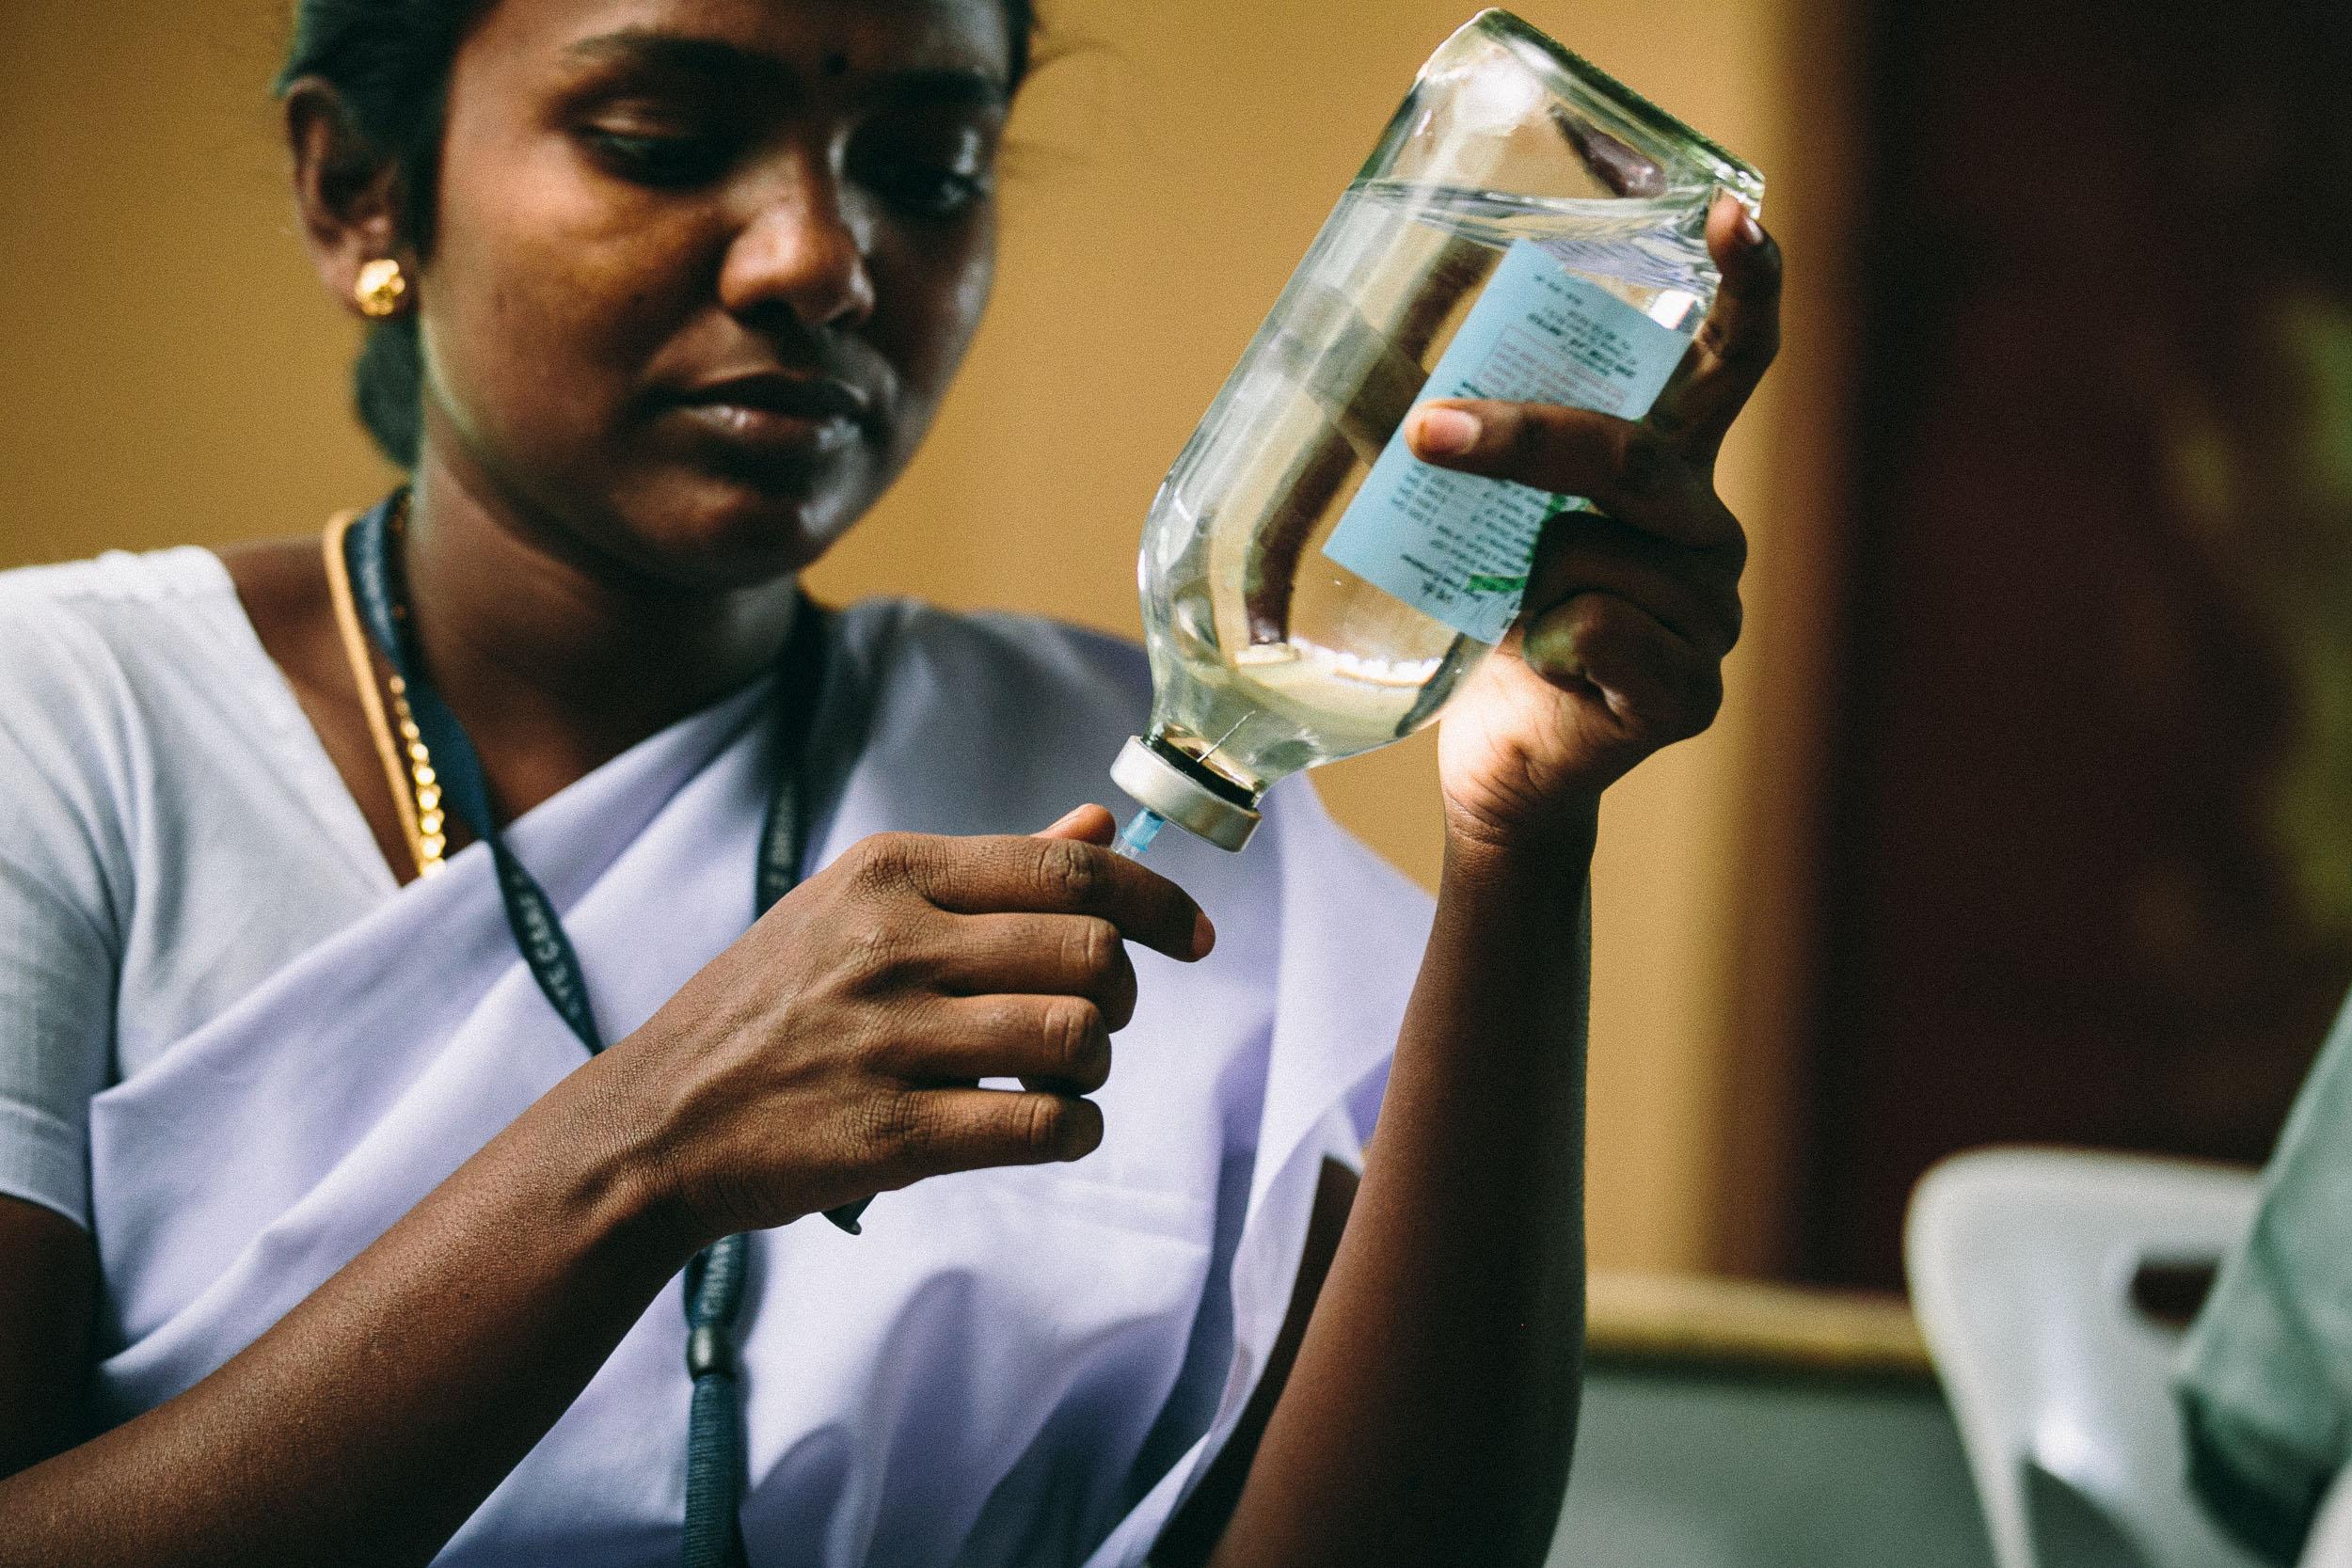 brian-callaway-india-photography-aravind-eye-hospital-07.jpg